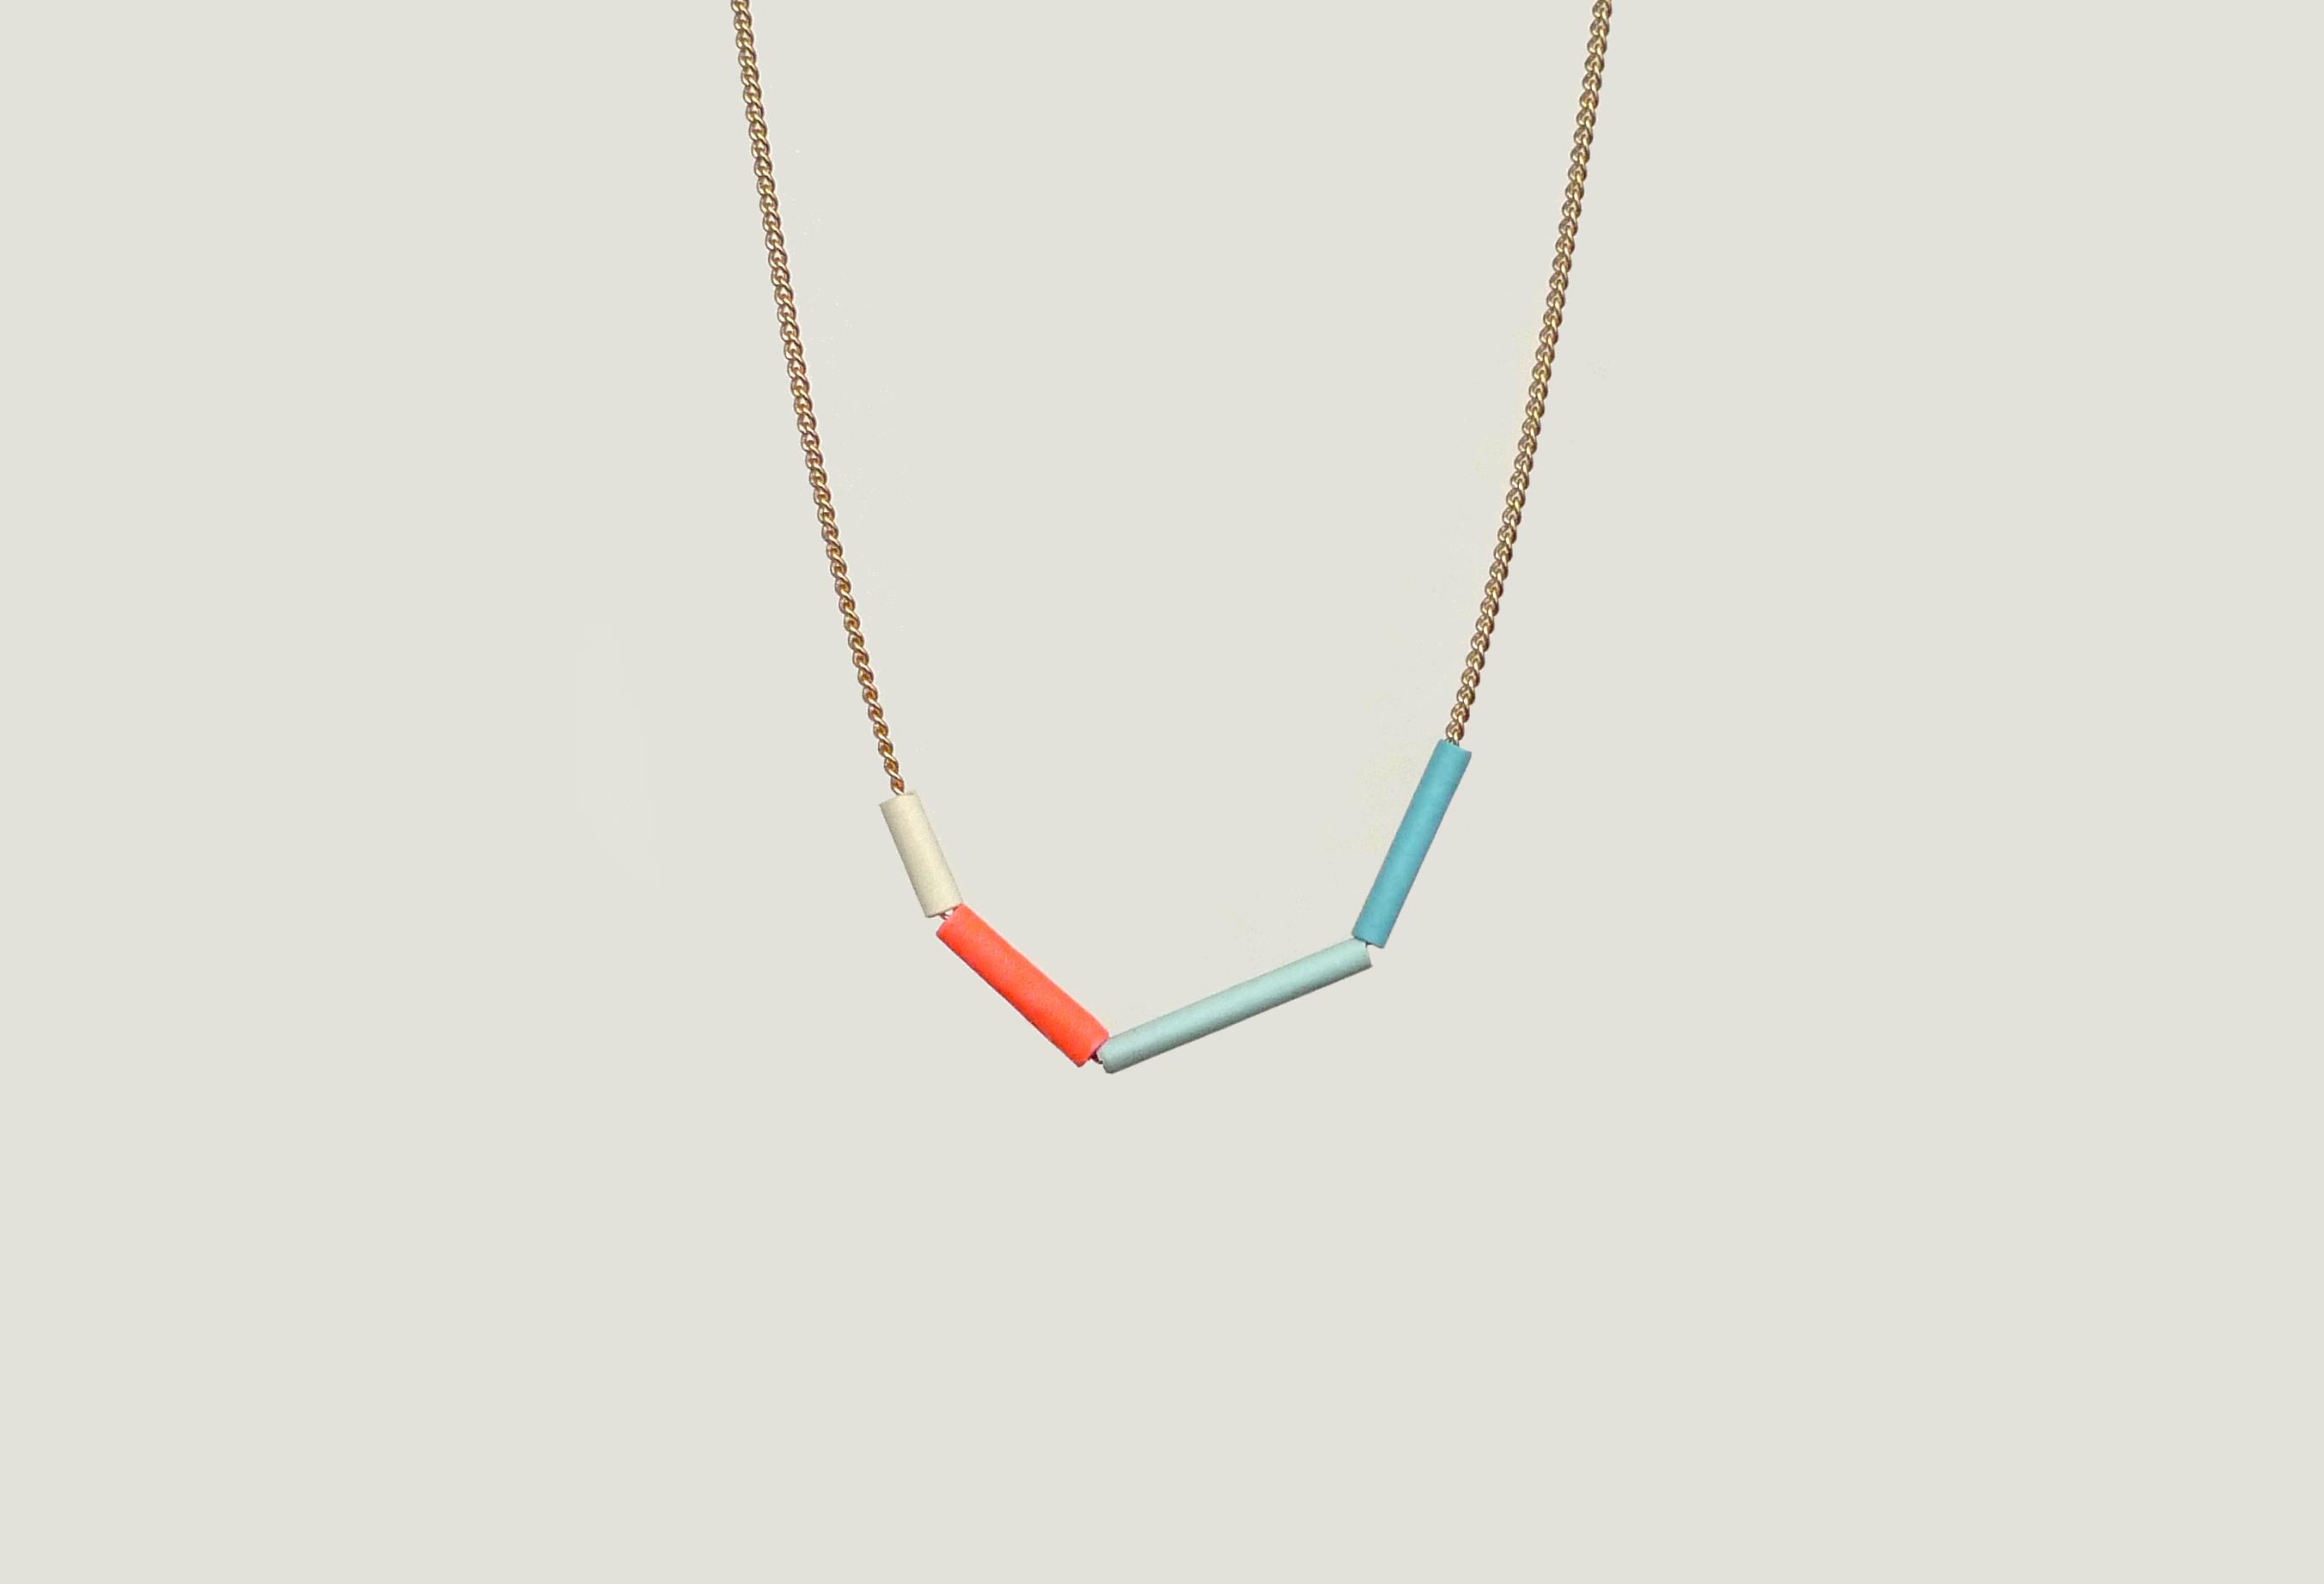 papierperle-kette-paperdesc-orange-blau-2016